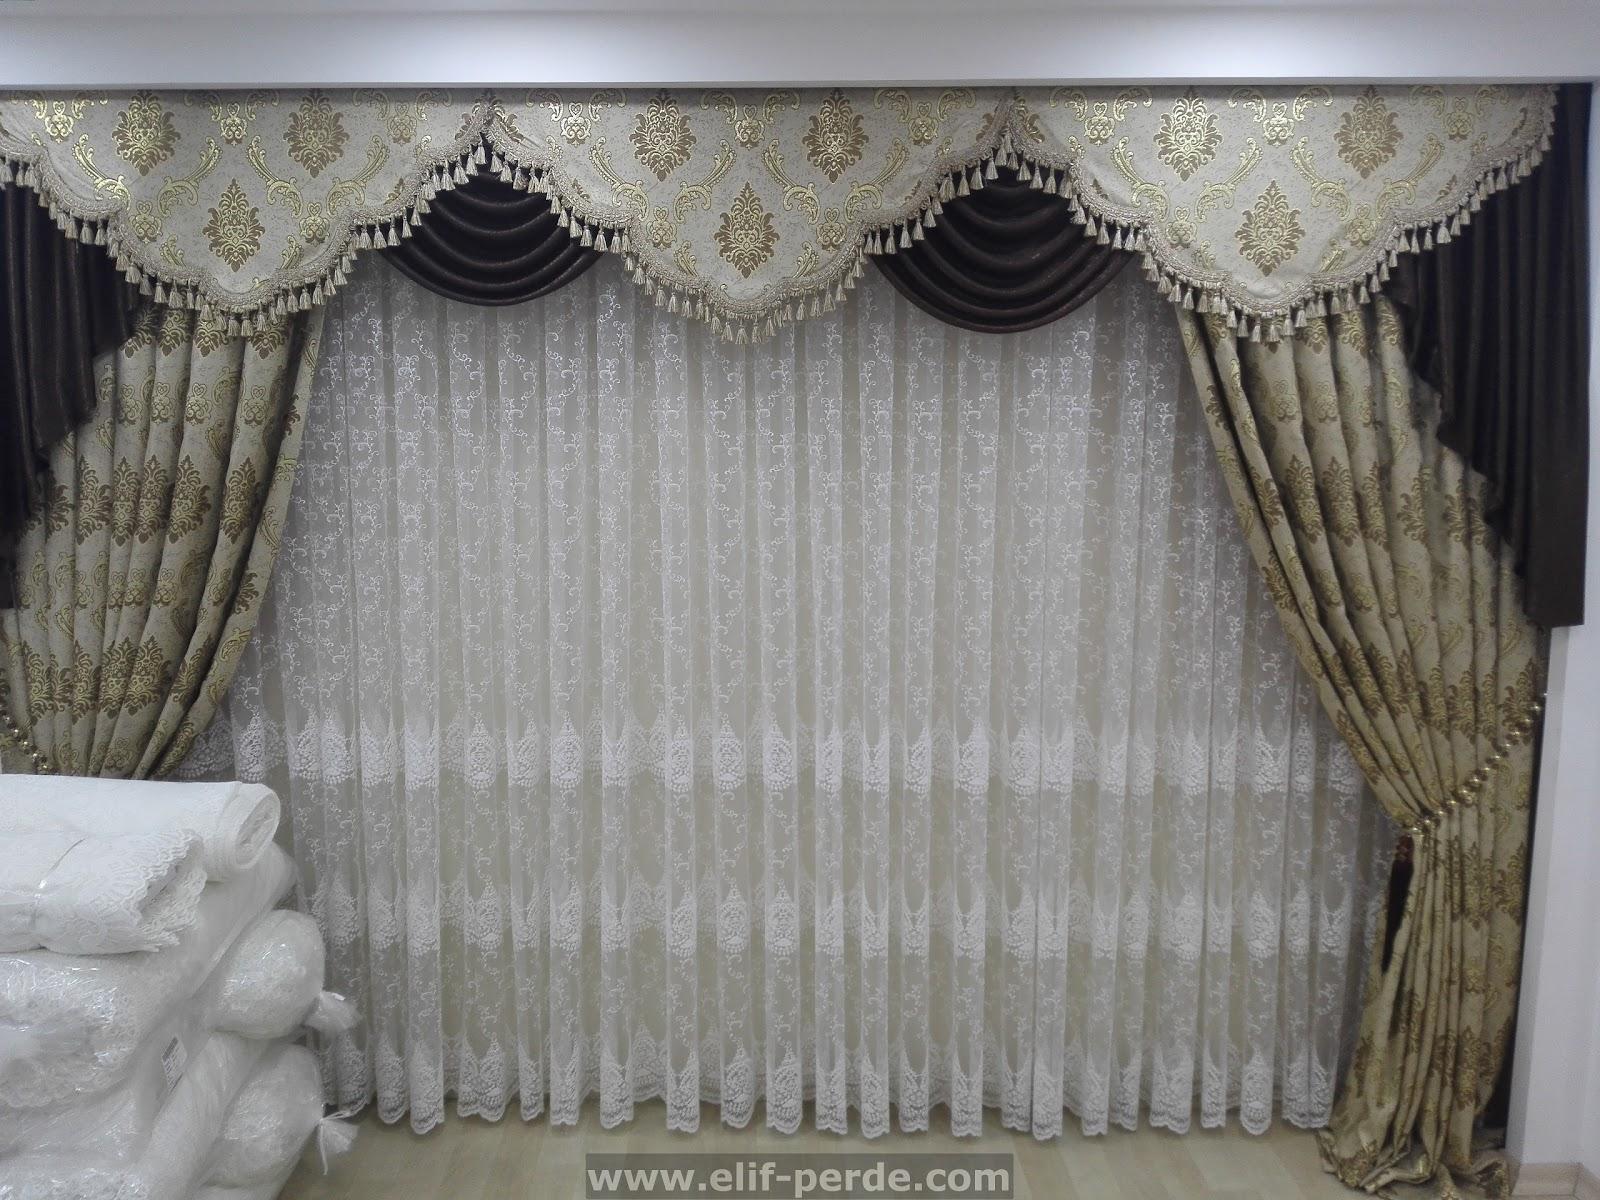 kahverengi alt n simli fon perde modeli elif perde. Black Bedroom Furniture Sets. Home Design Ideas